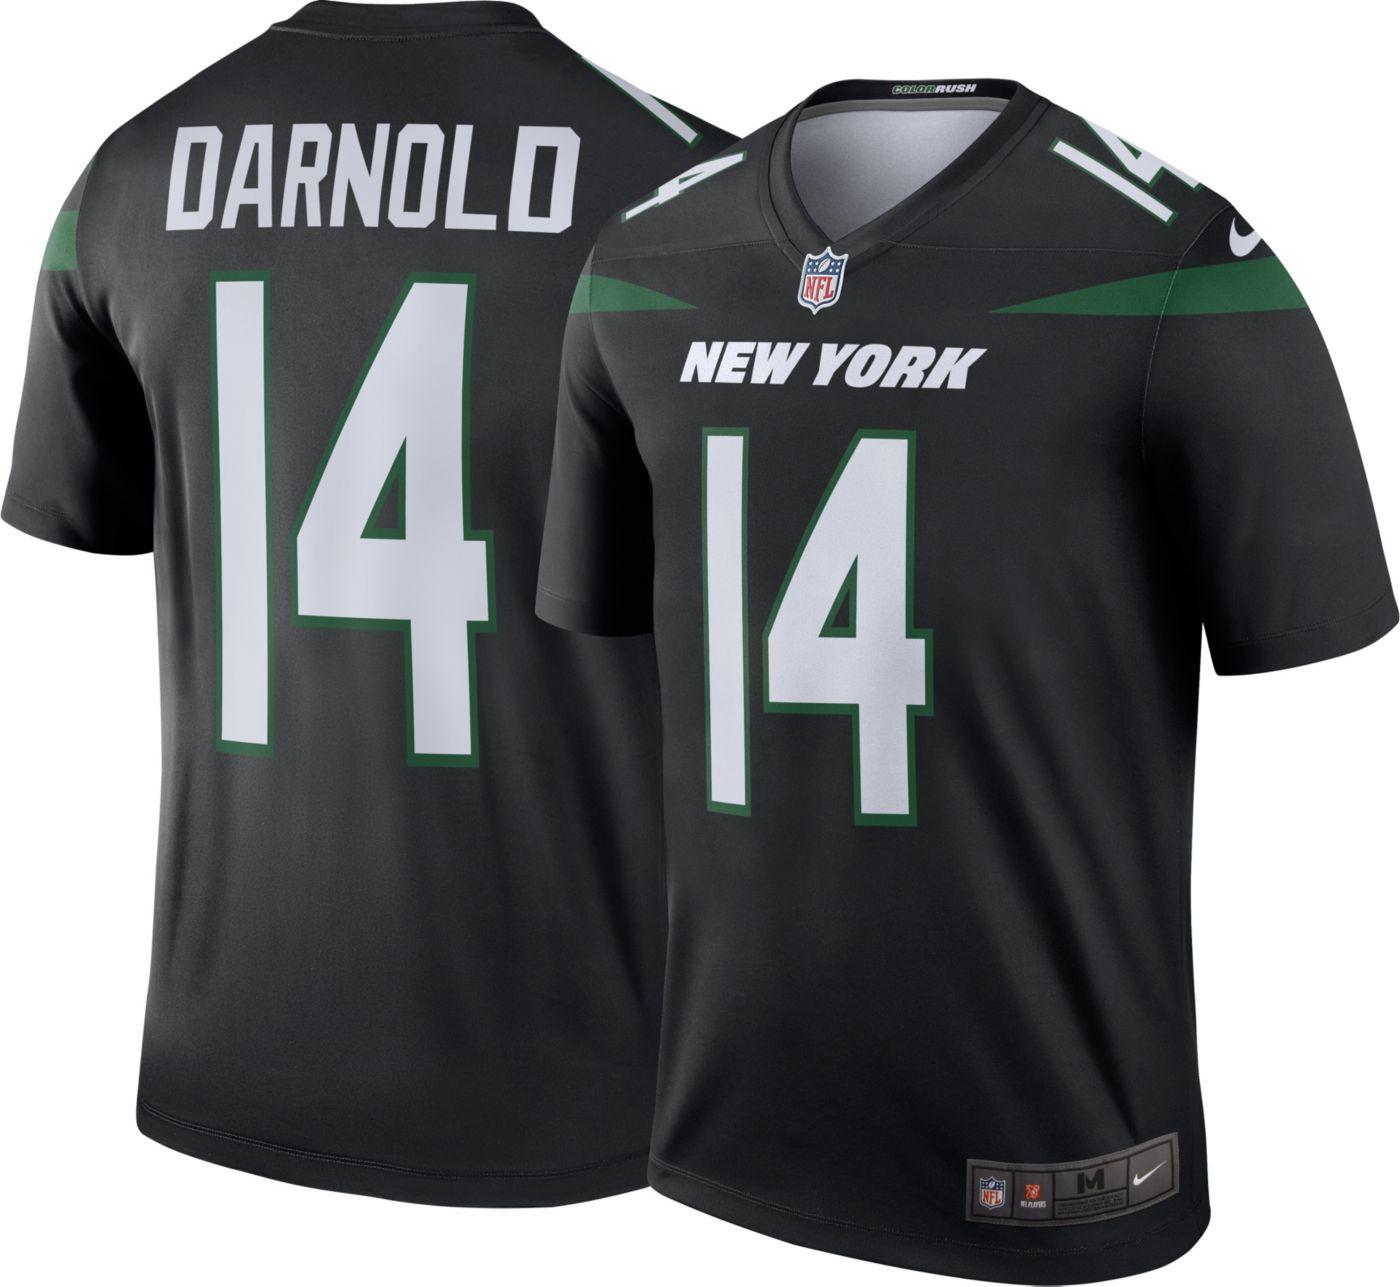 Nike Men's Color Rush Legend Black Jersey New York Jets Sam Darnold #14